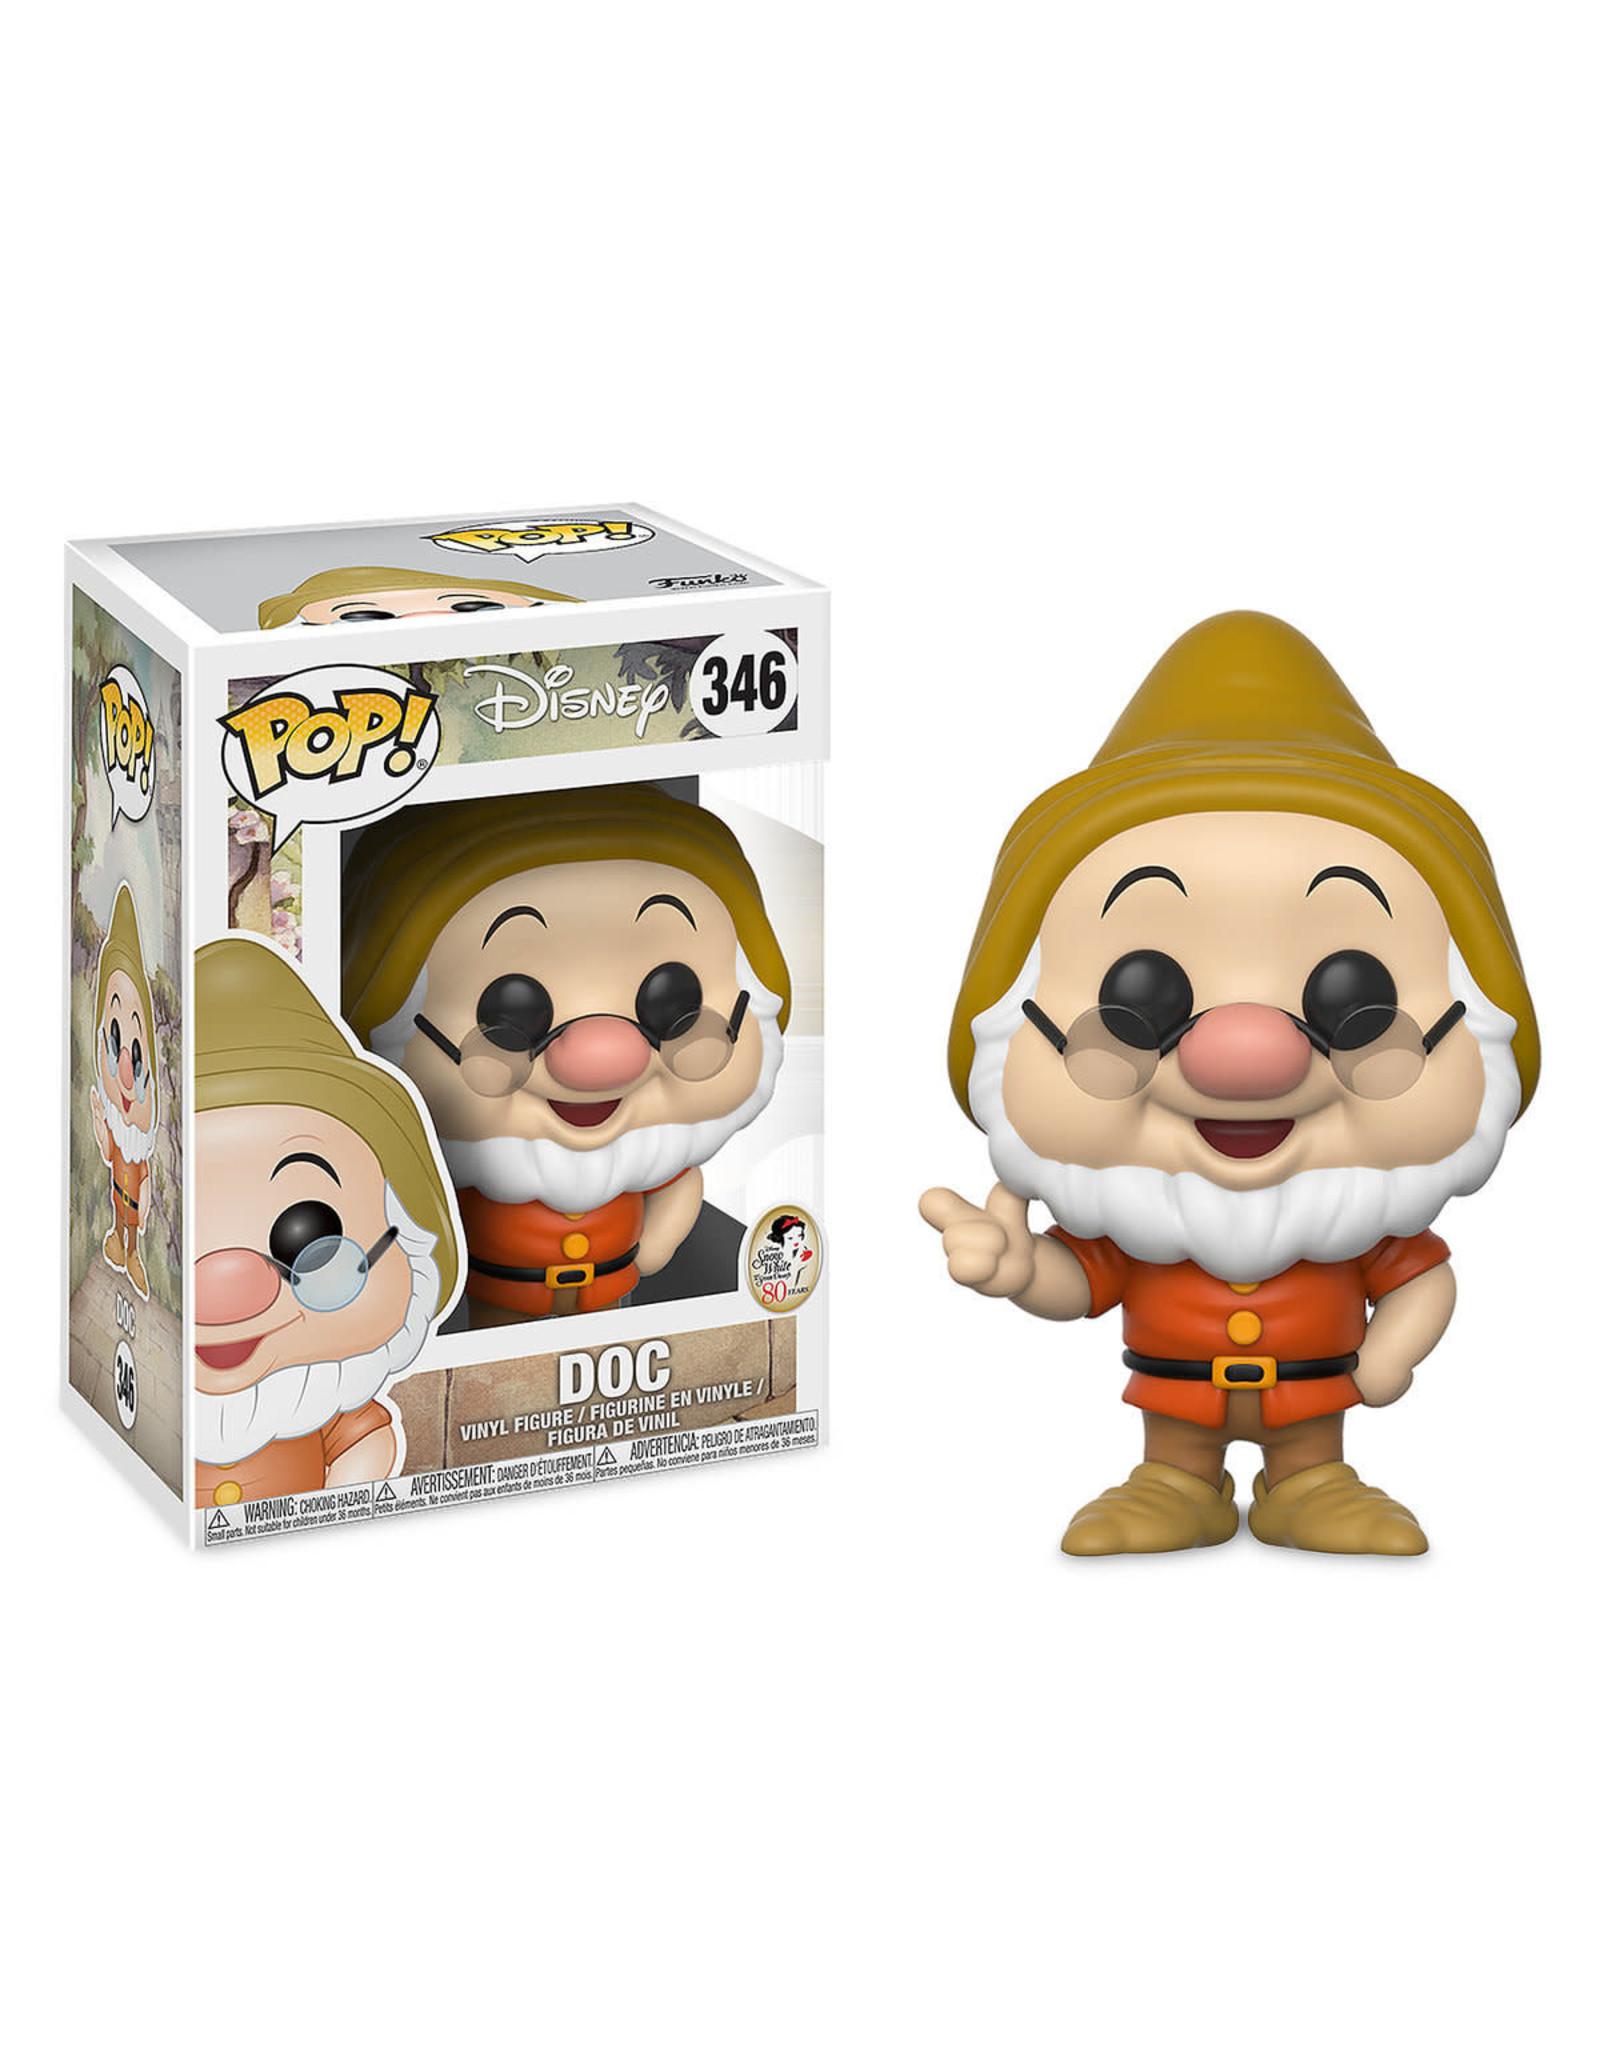 Funko Pop! Funko Pop! Disney nr346 Doc